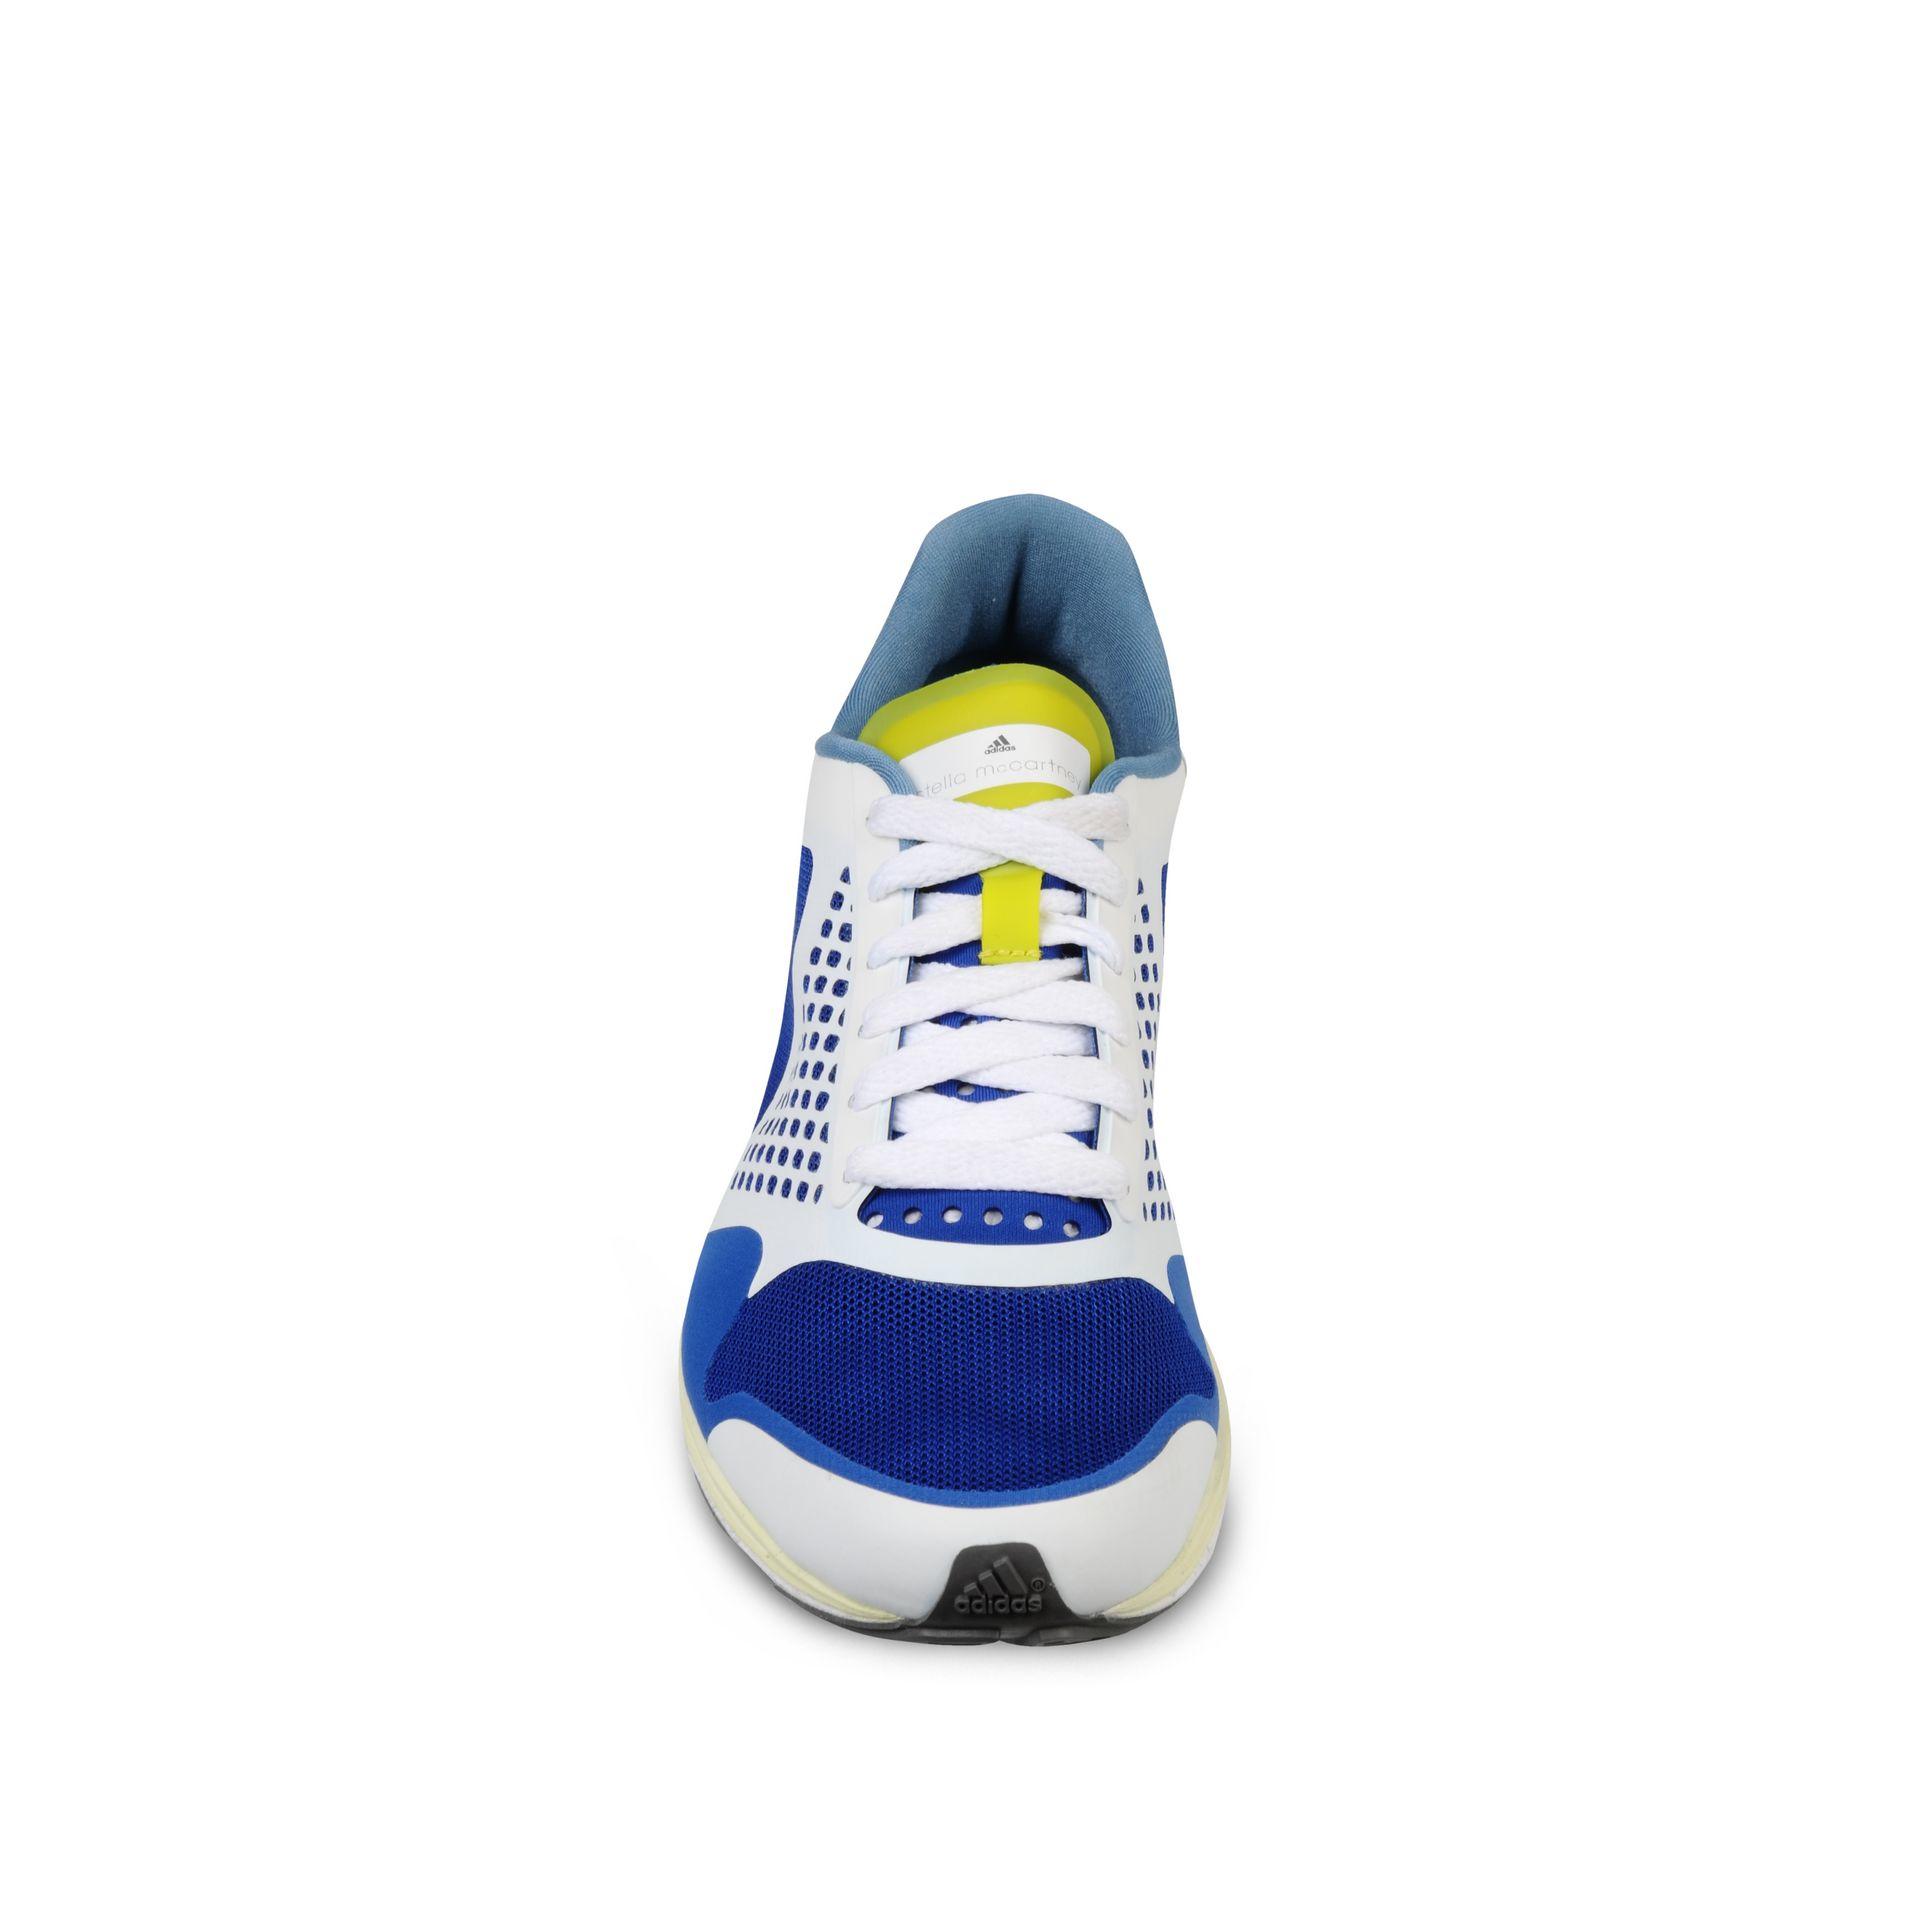 Racing Flats Running Shoes Uk